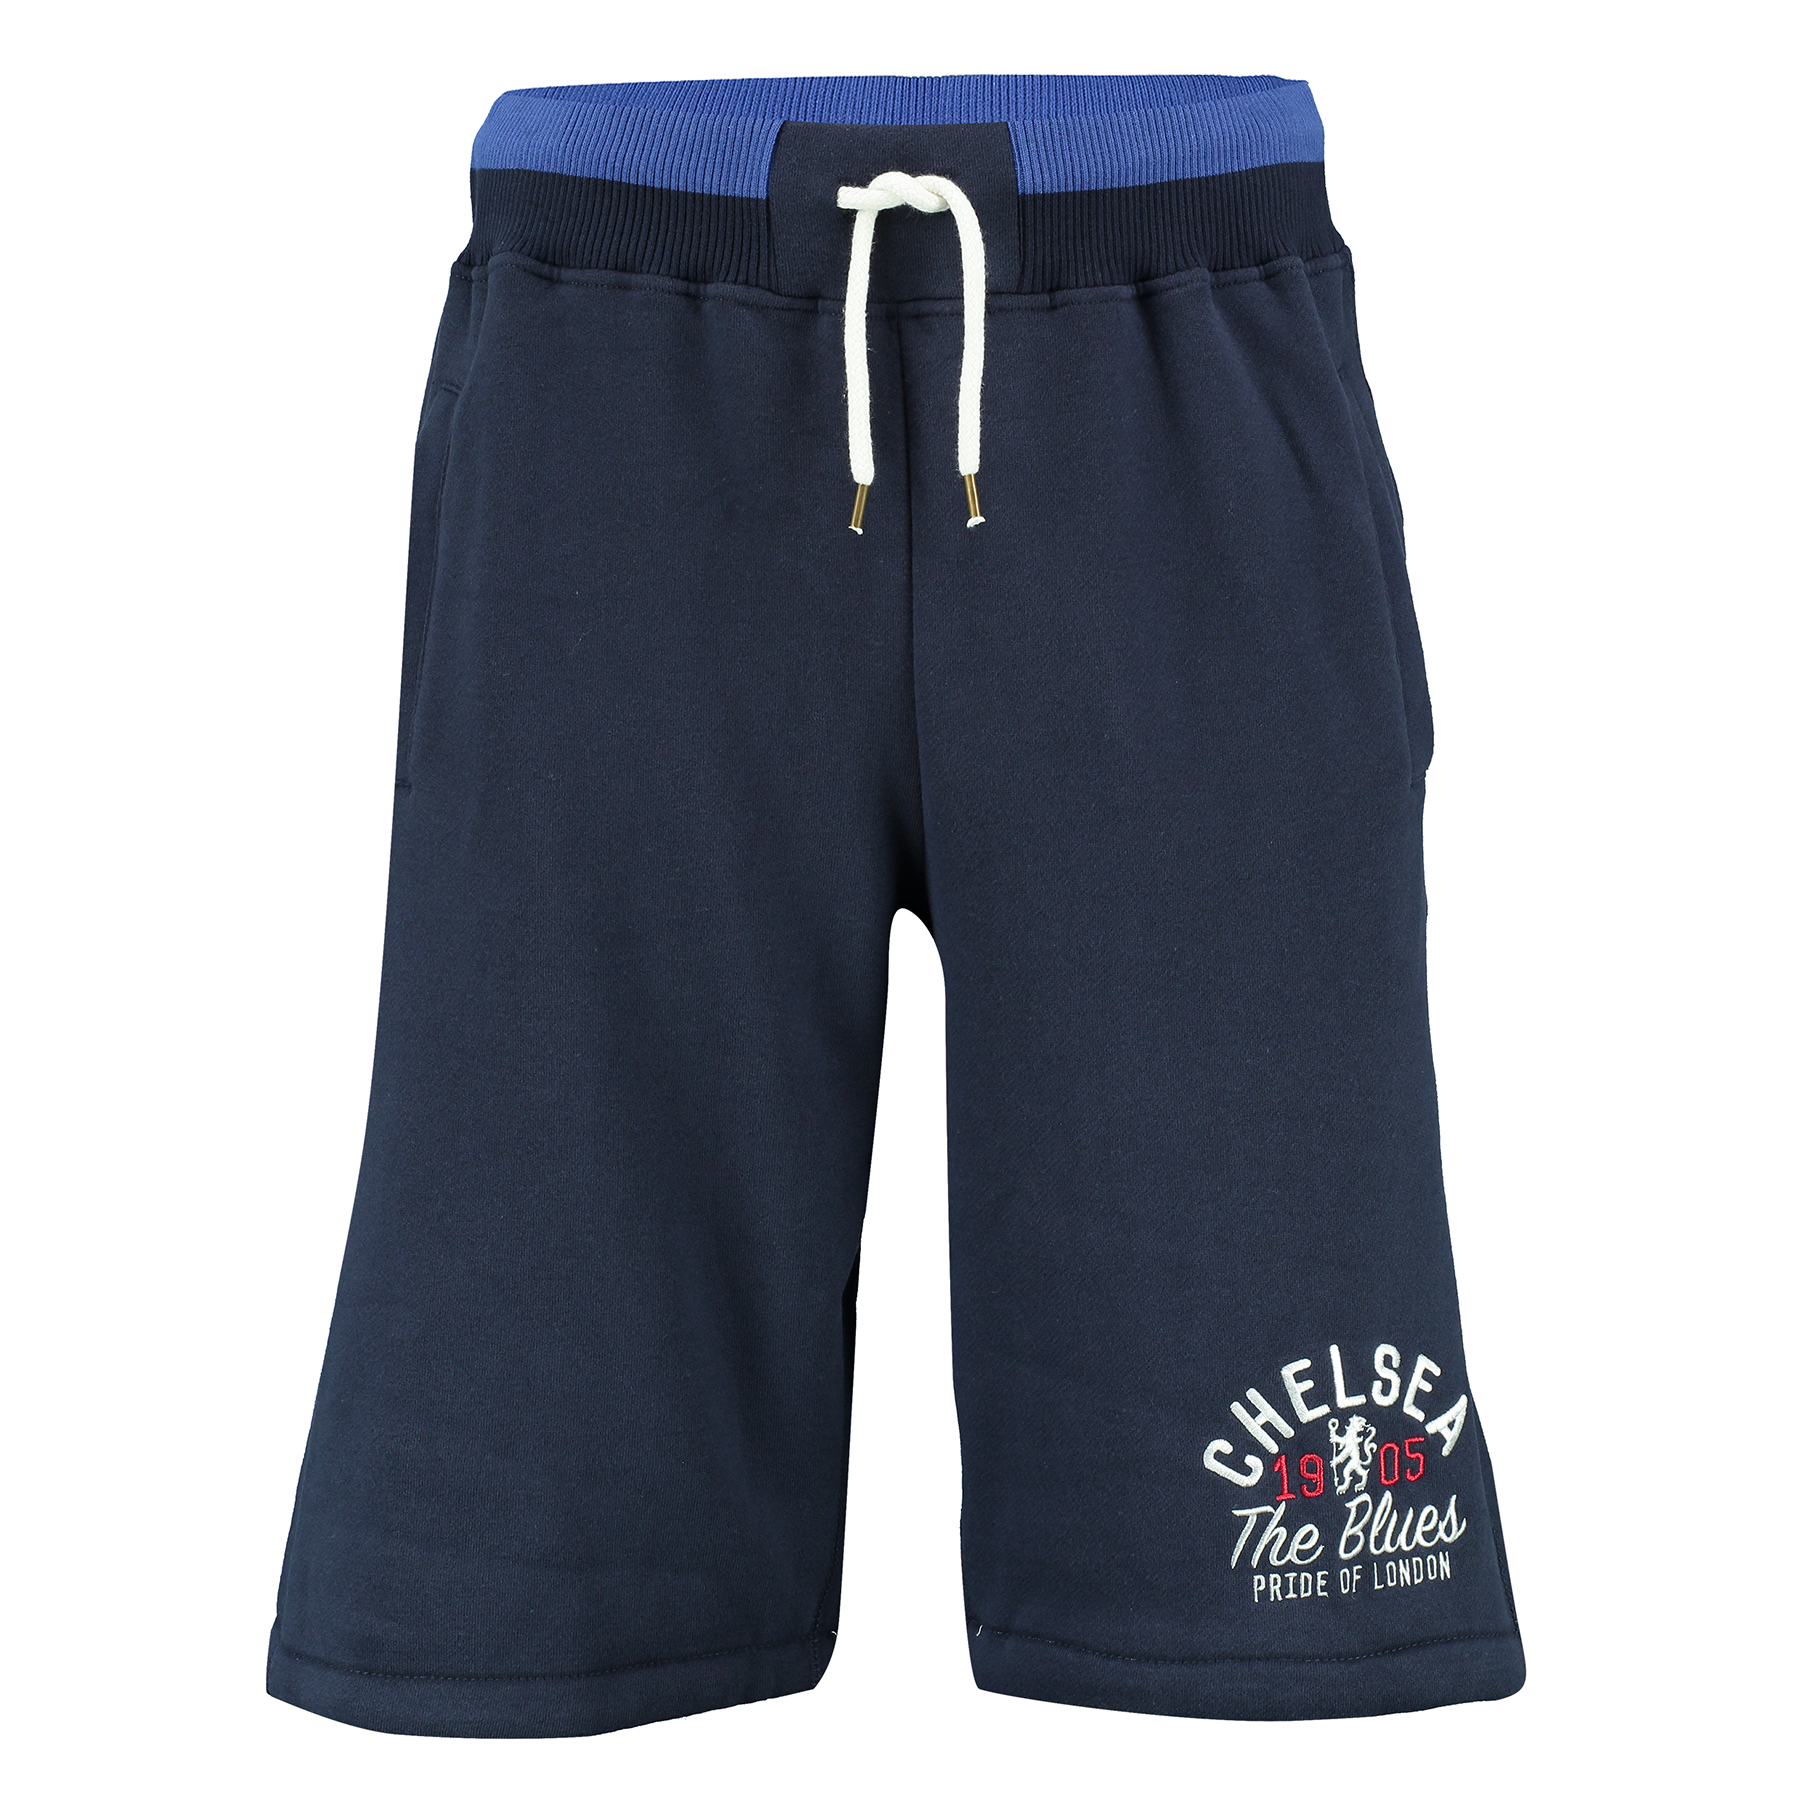 Chelsea Heritage Fleece Jog Shorts - Navy - Mens